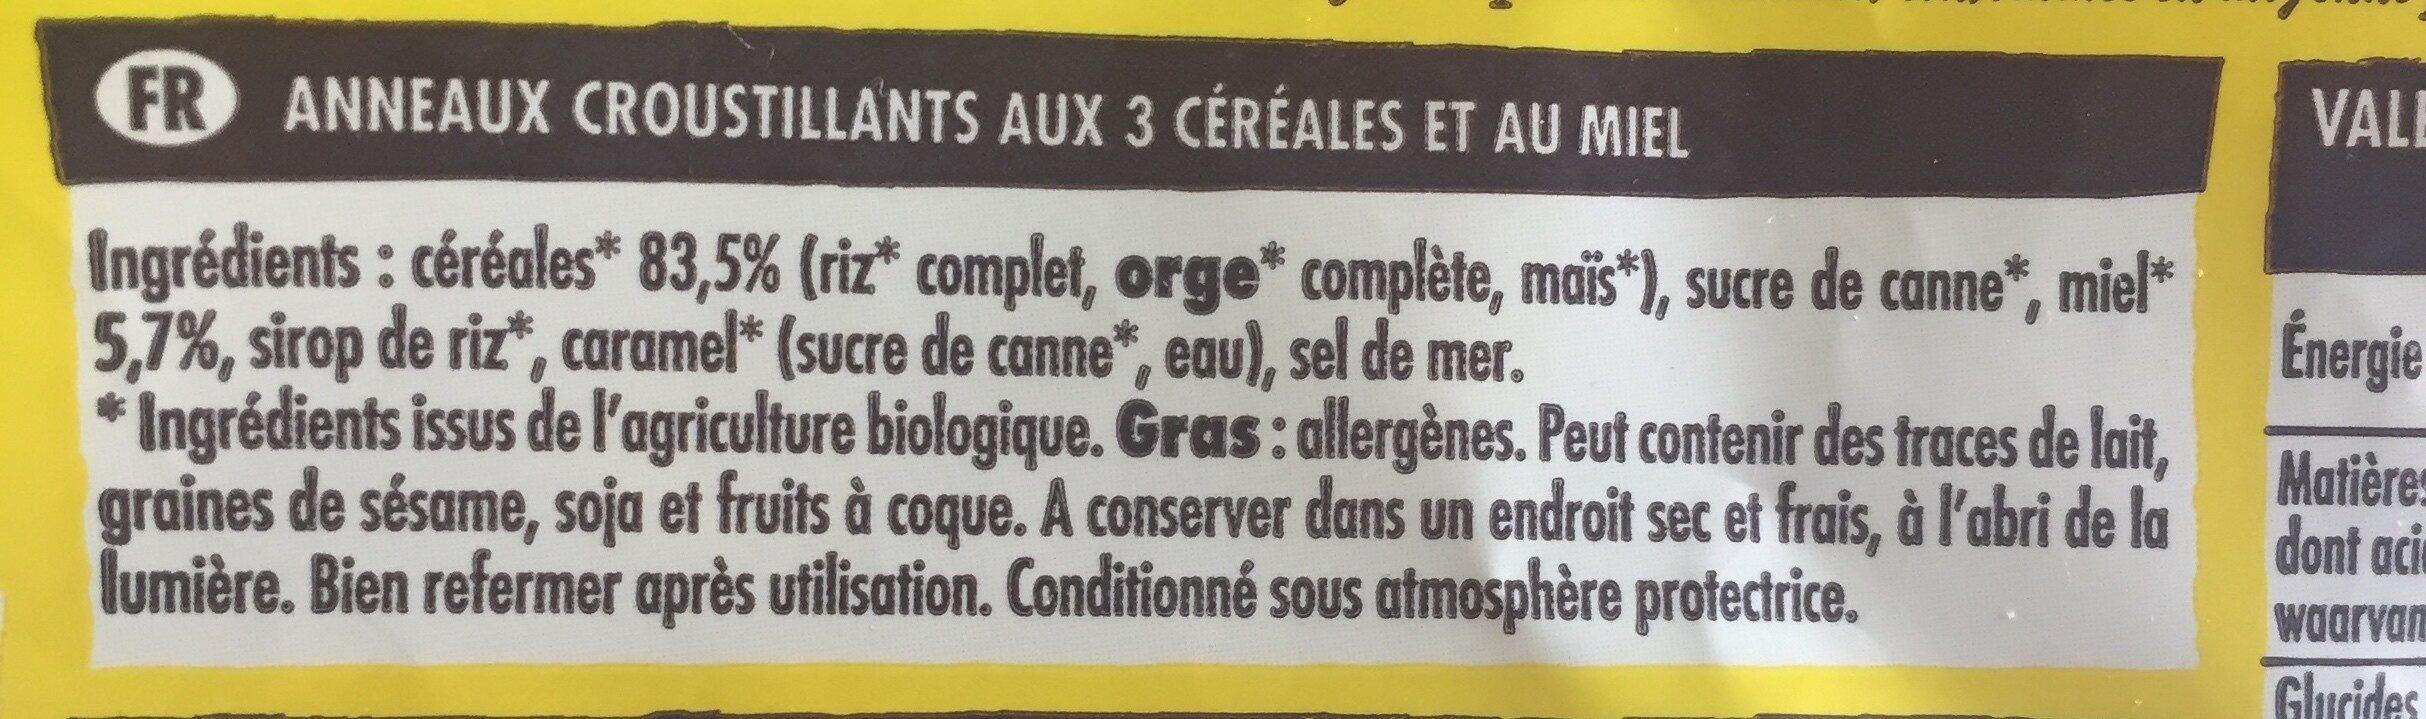 Crosti oz Miel - Ingrédients - fr